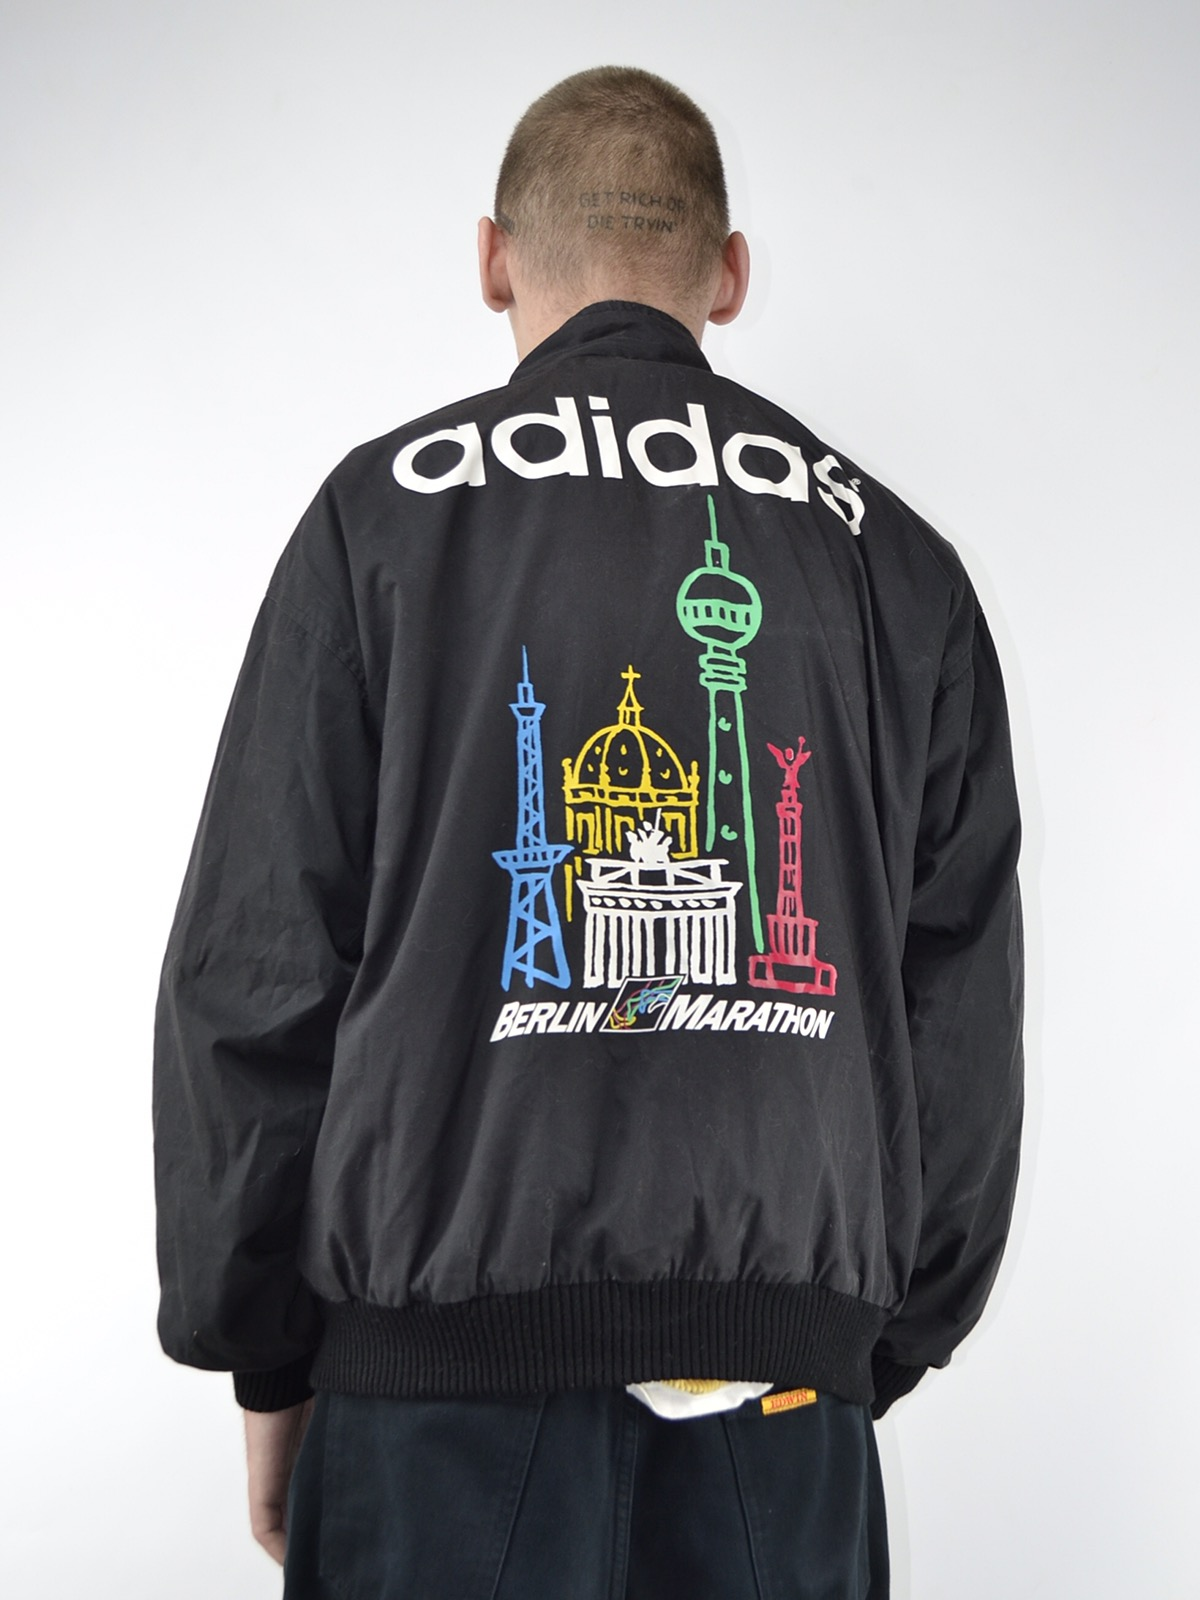 berlin marathon adidas jacket